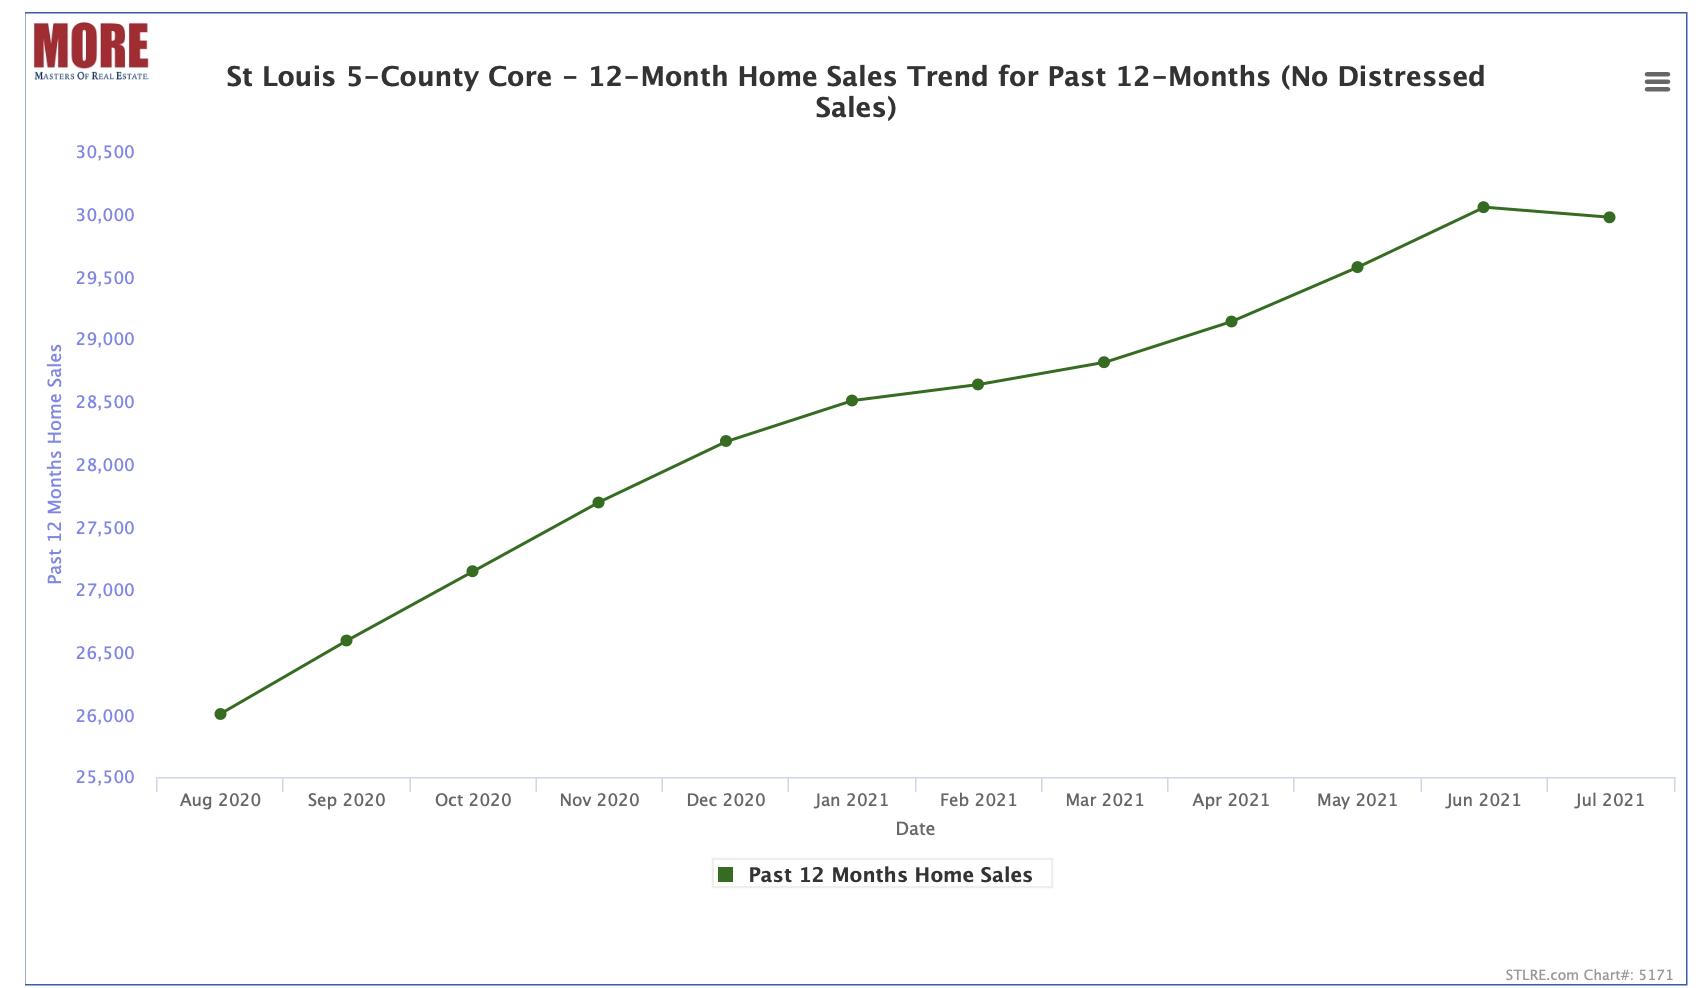 12-Month Home Sales Trend - St Louis 5-County Core Market (no distressed sales) - Past 25 Months